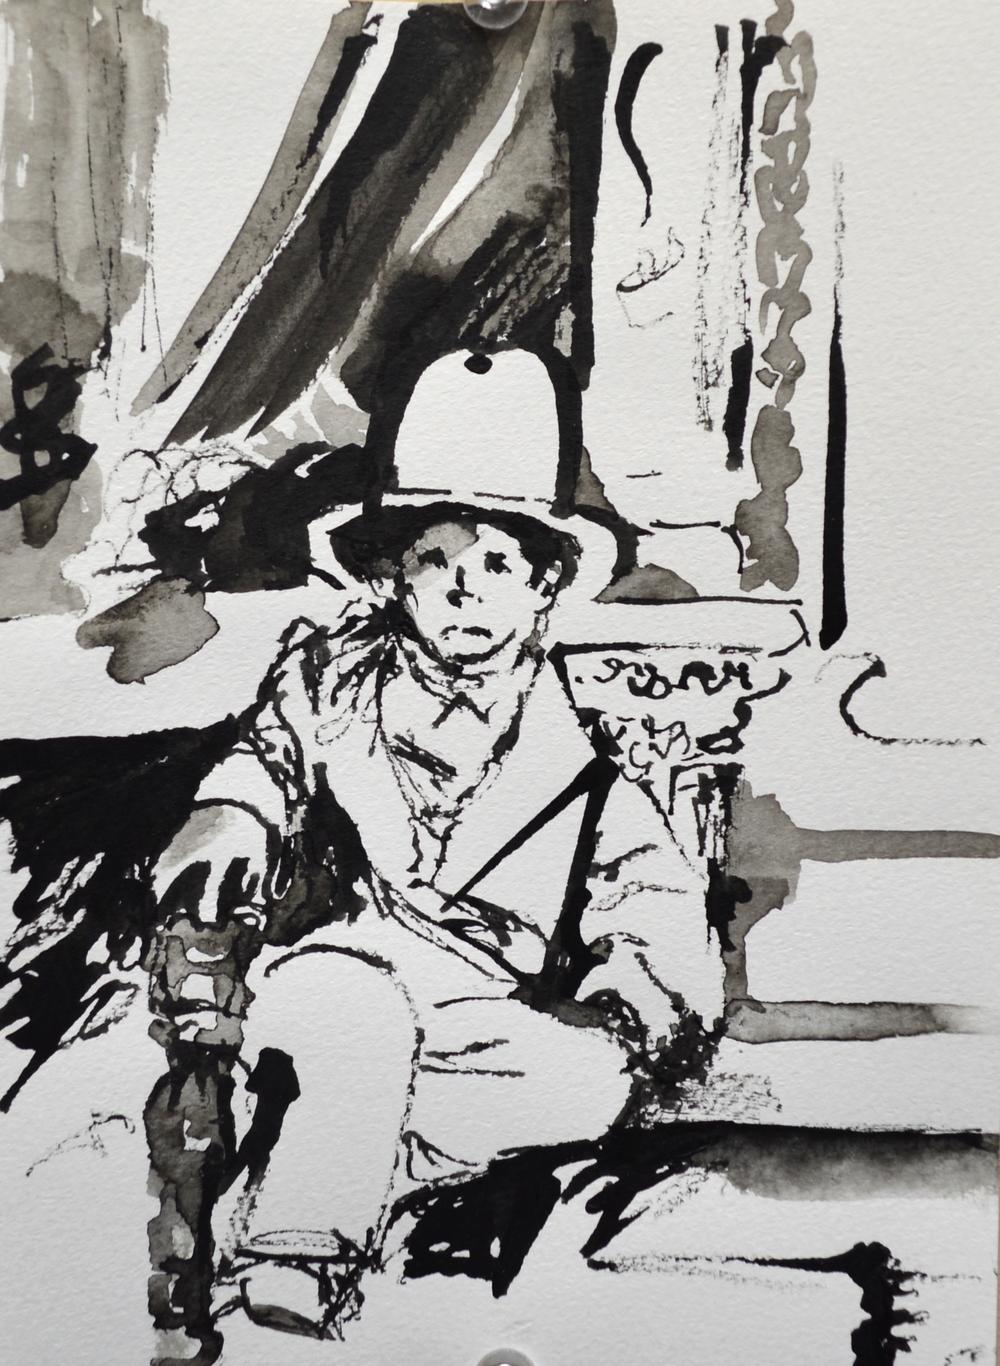 Cowboy Joe